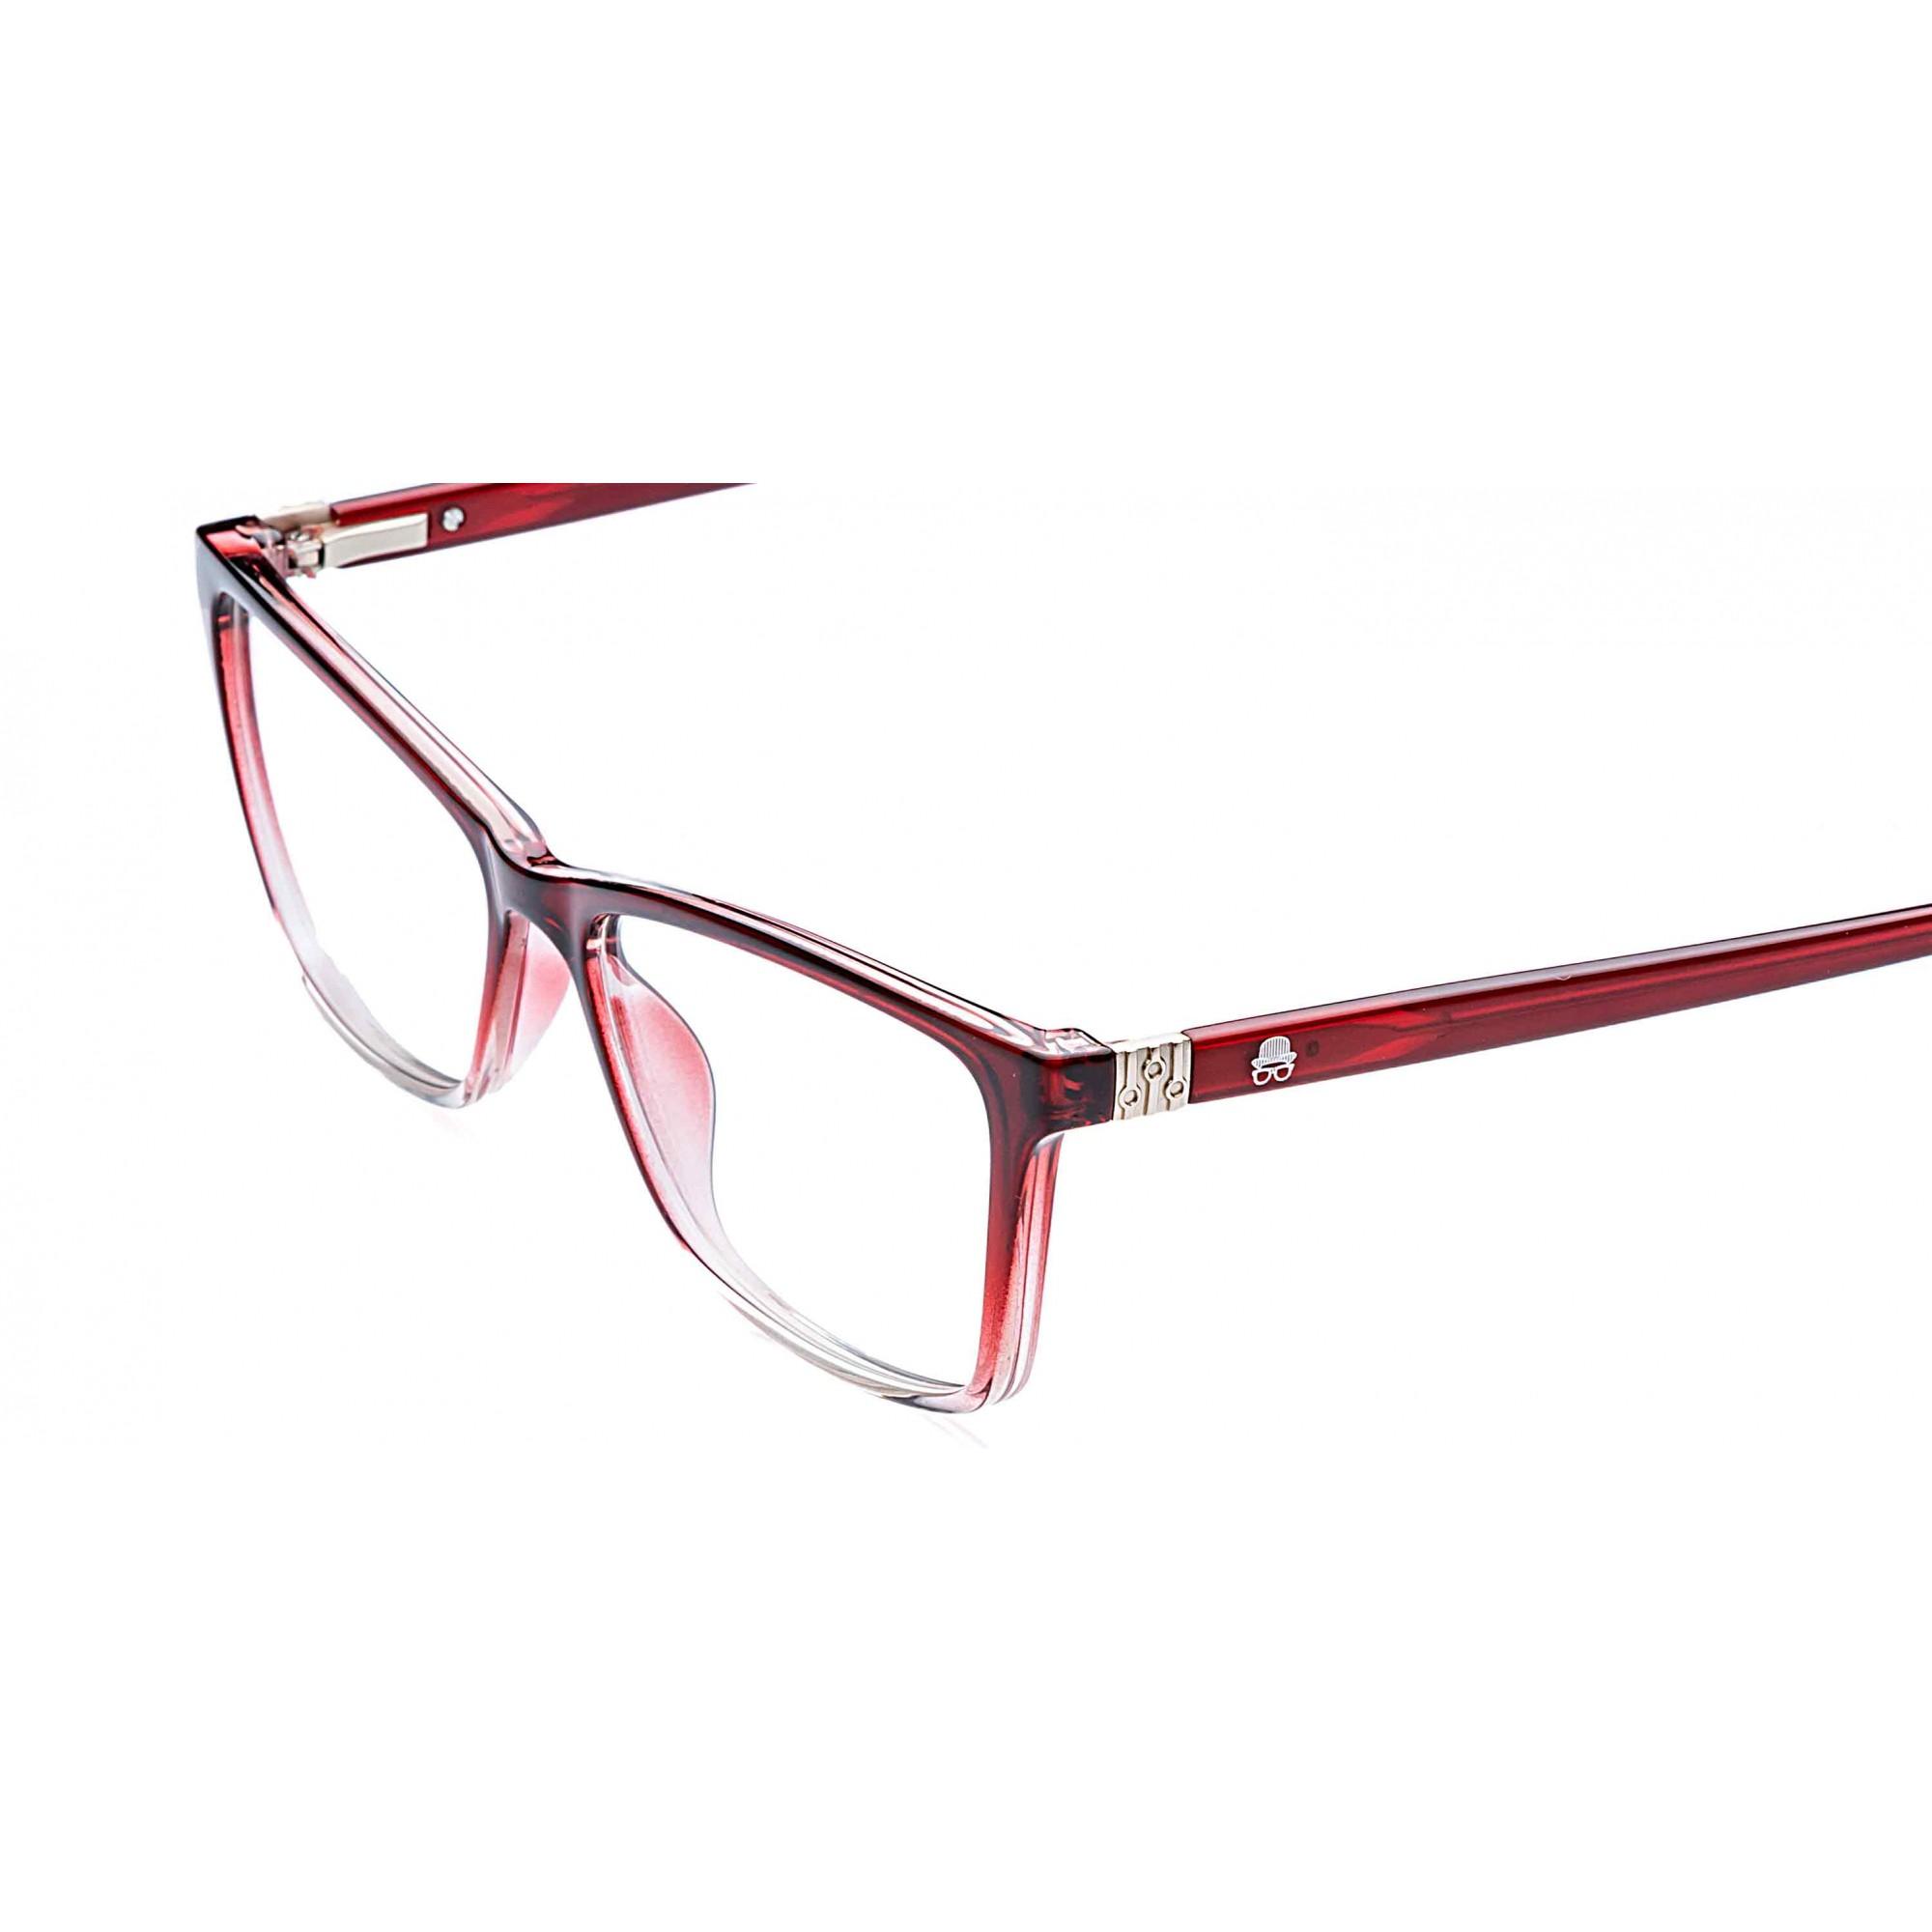 Óculos de Grau Iris Rafael Lopes Eyewear